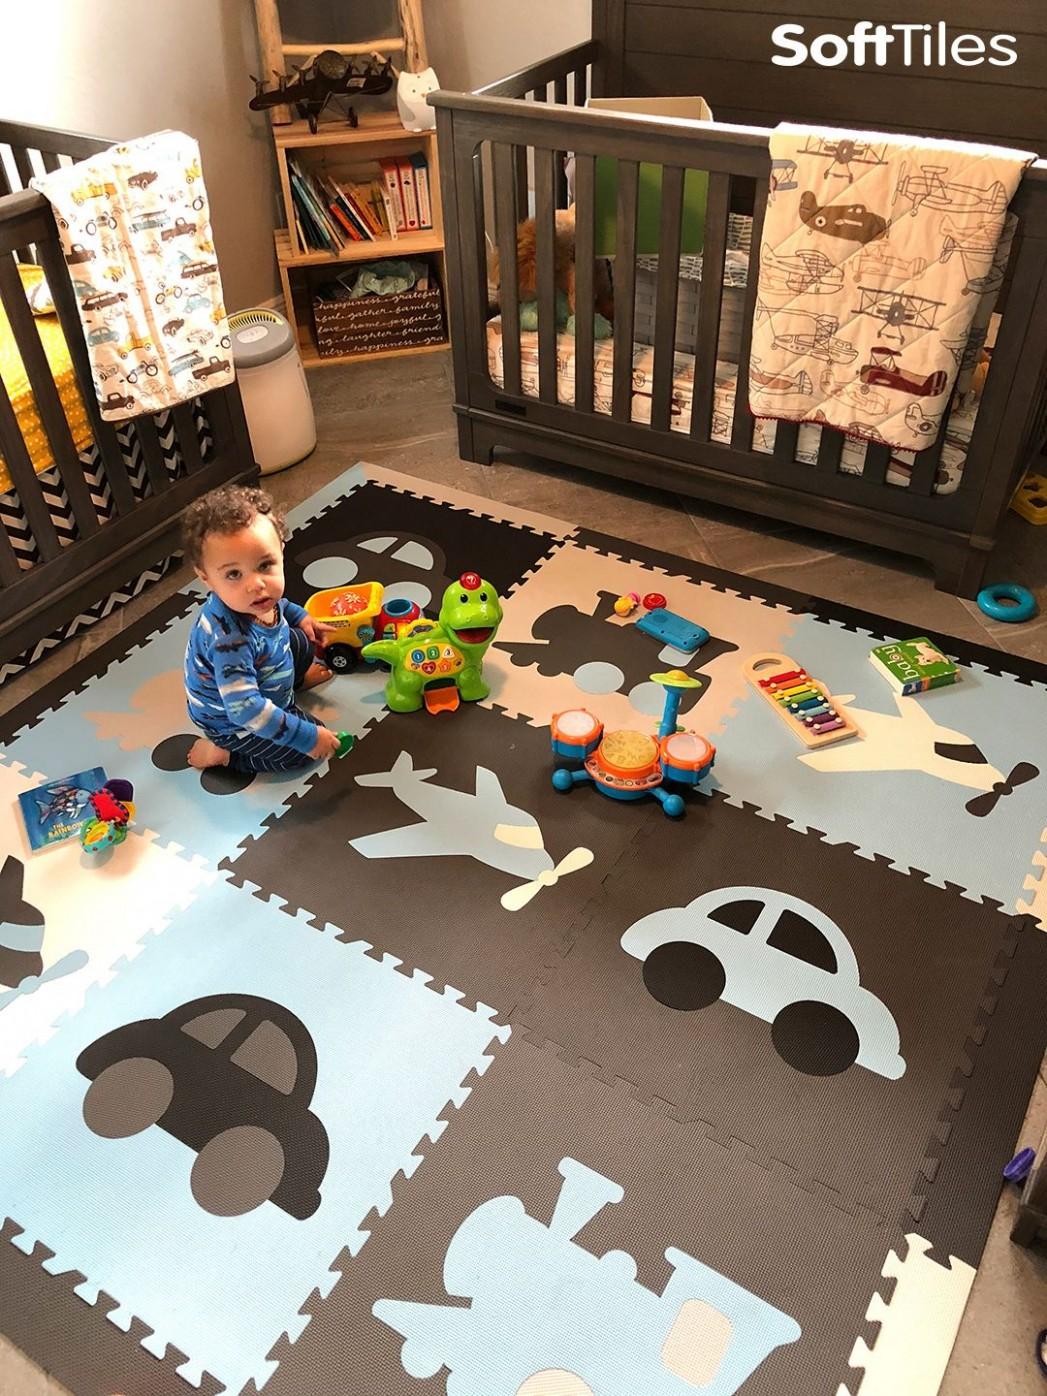 Fun transportation theme play mats for a nursery or playroom  - Baby Room Floor Mat